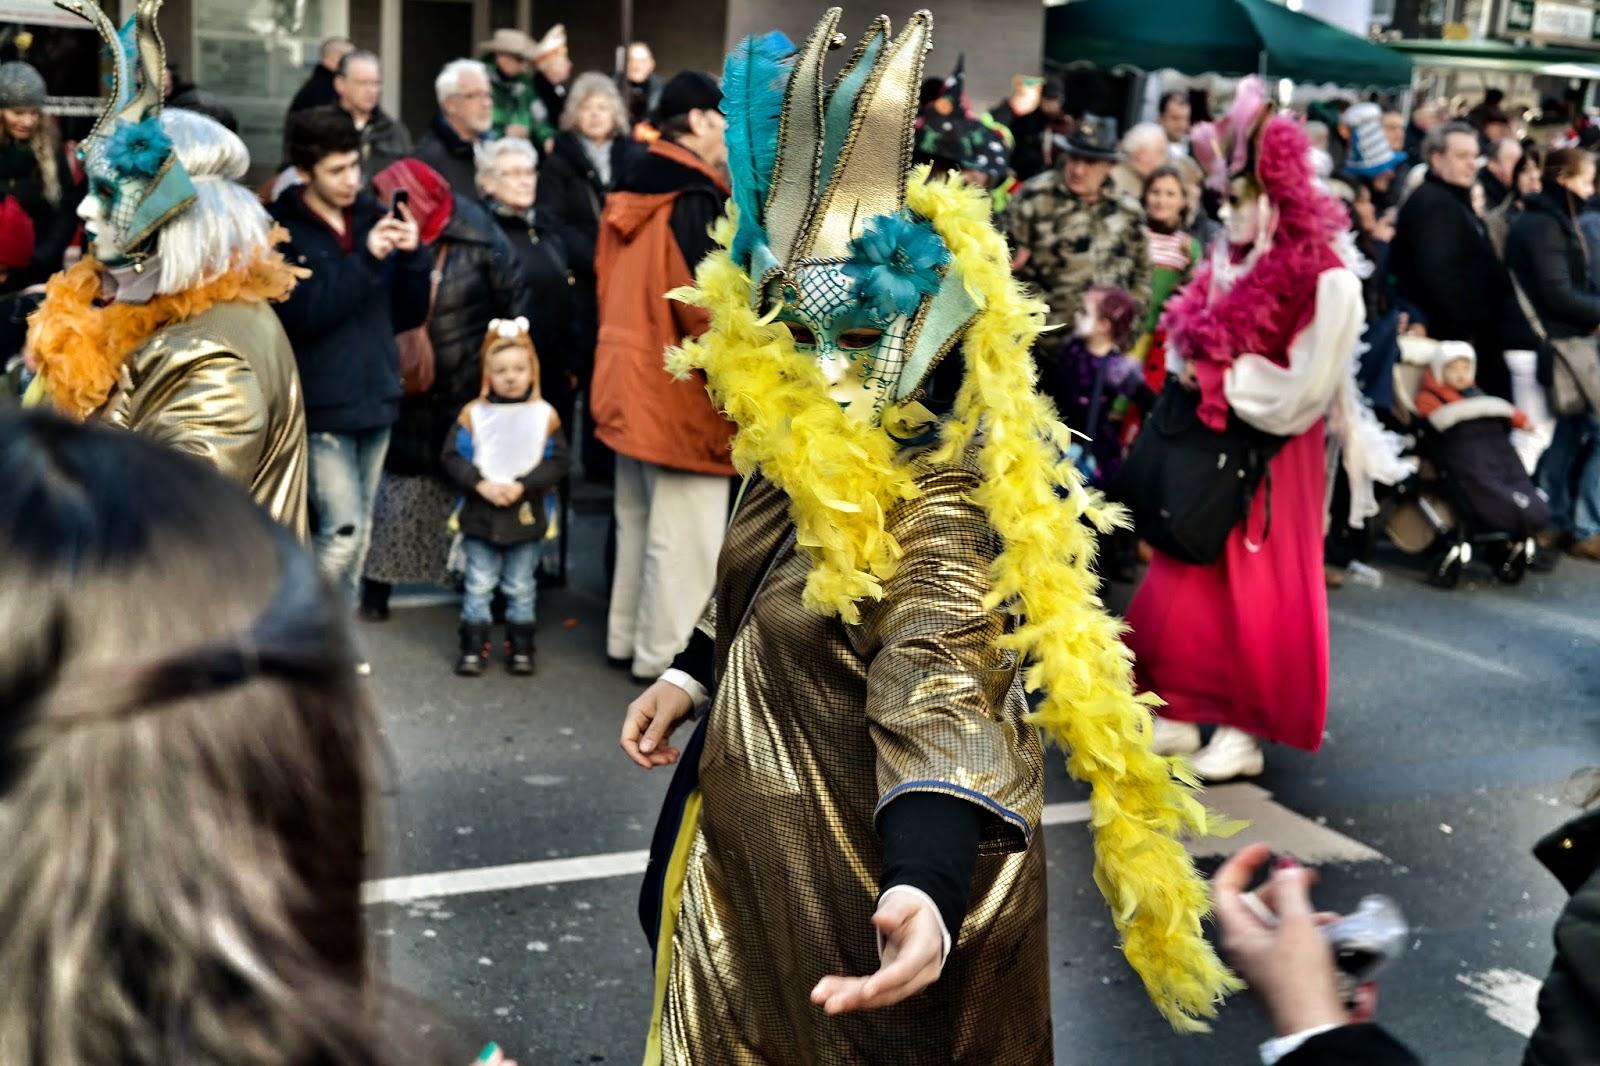 Wuppertal: hättse dat gedacht!? - Rosensonntag Strassenkarneval in Wuppertal - Atomlabor Blog Stadtleben